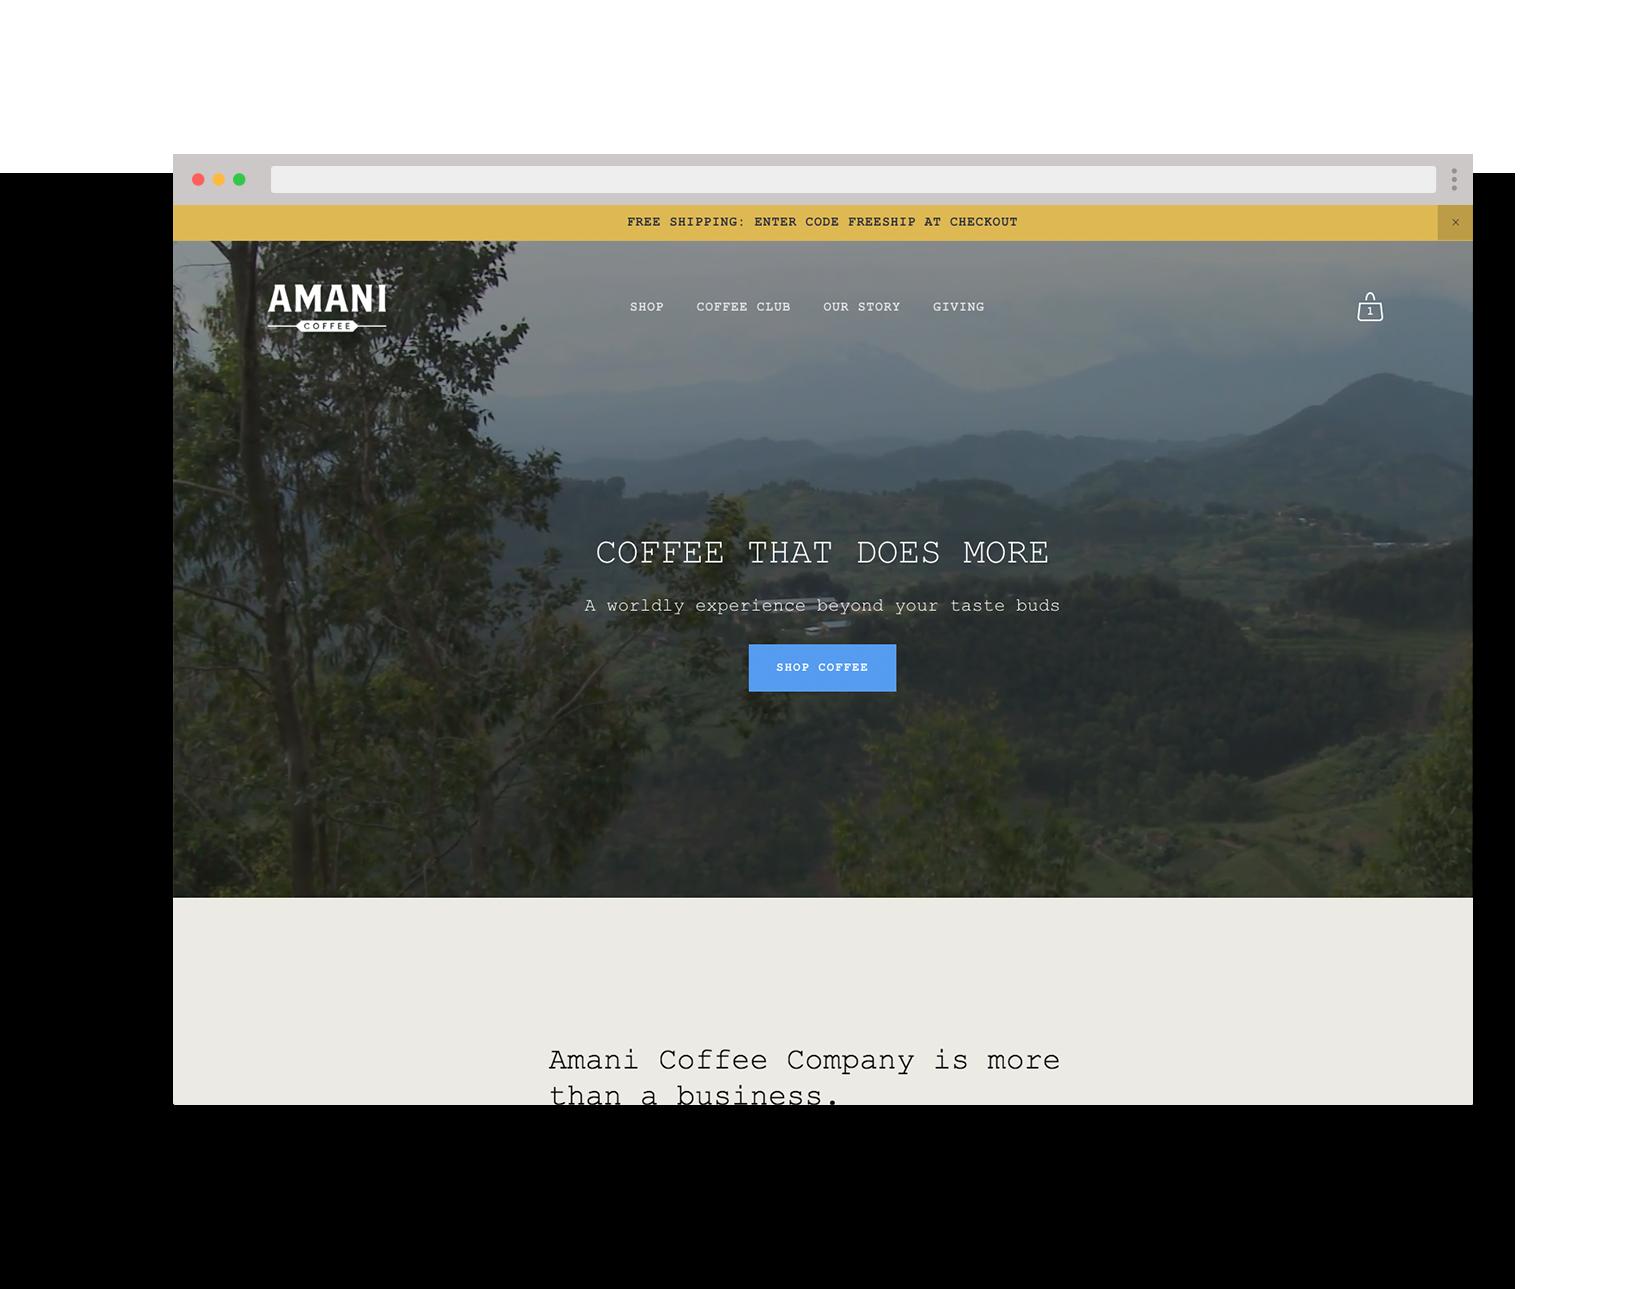 amani-browser-hp.png